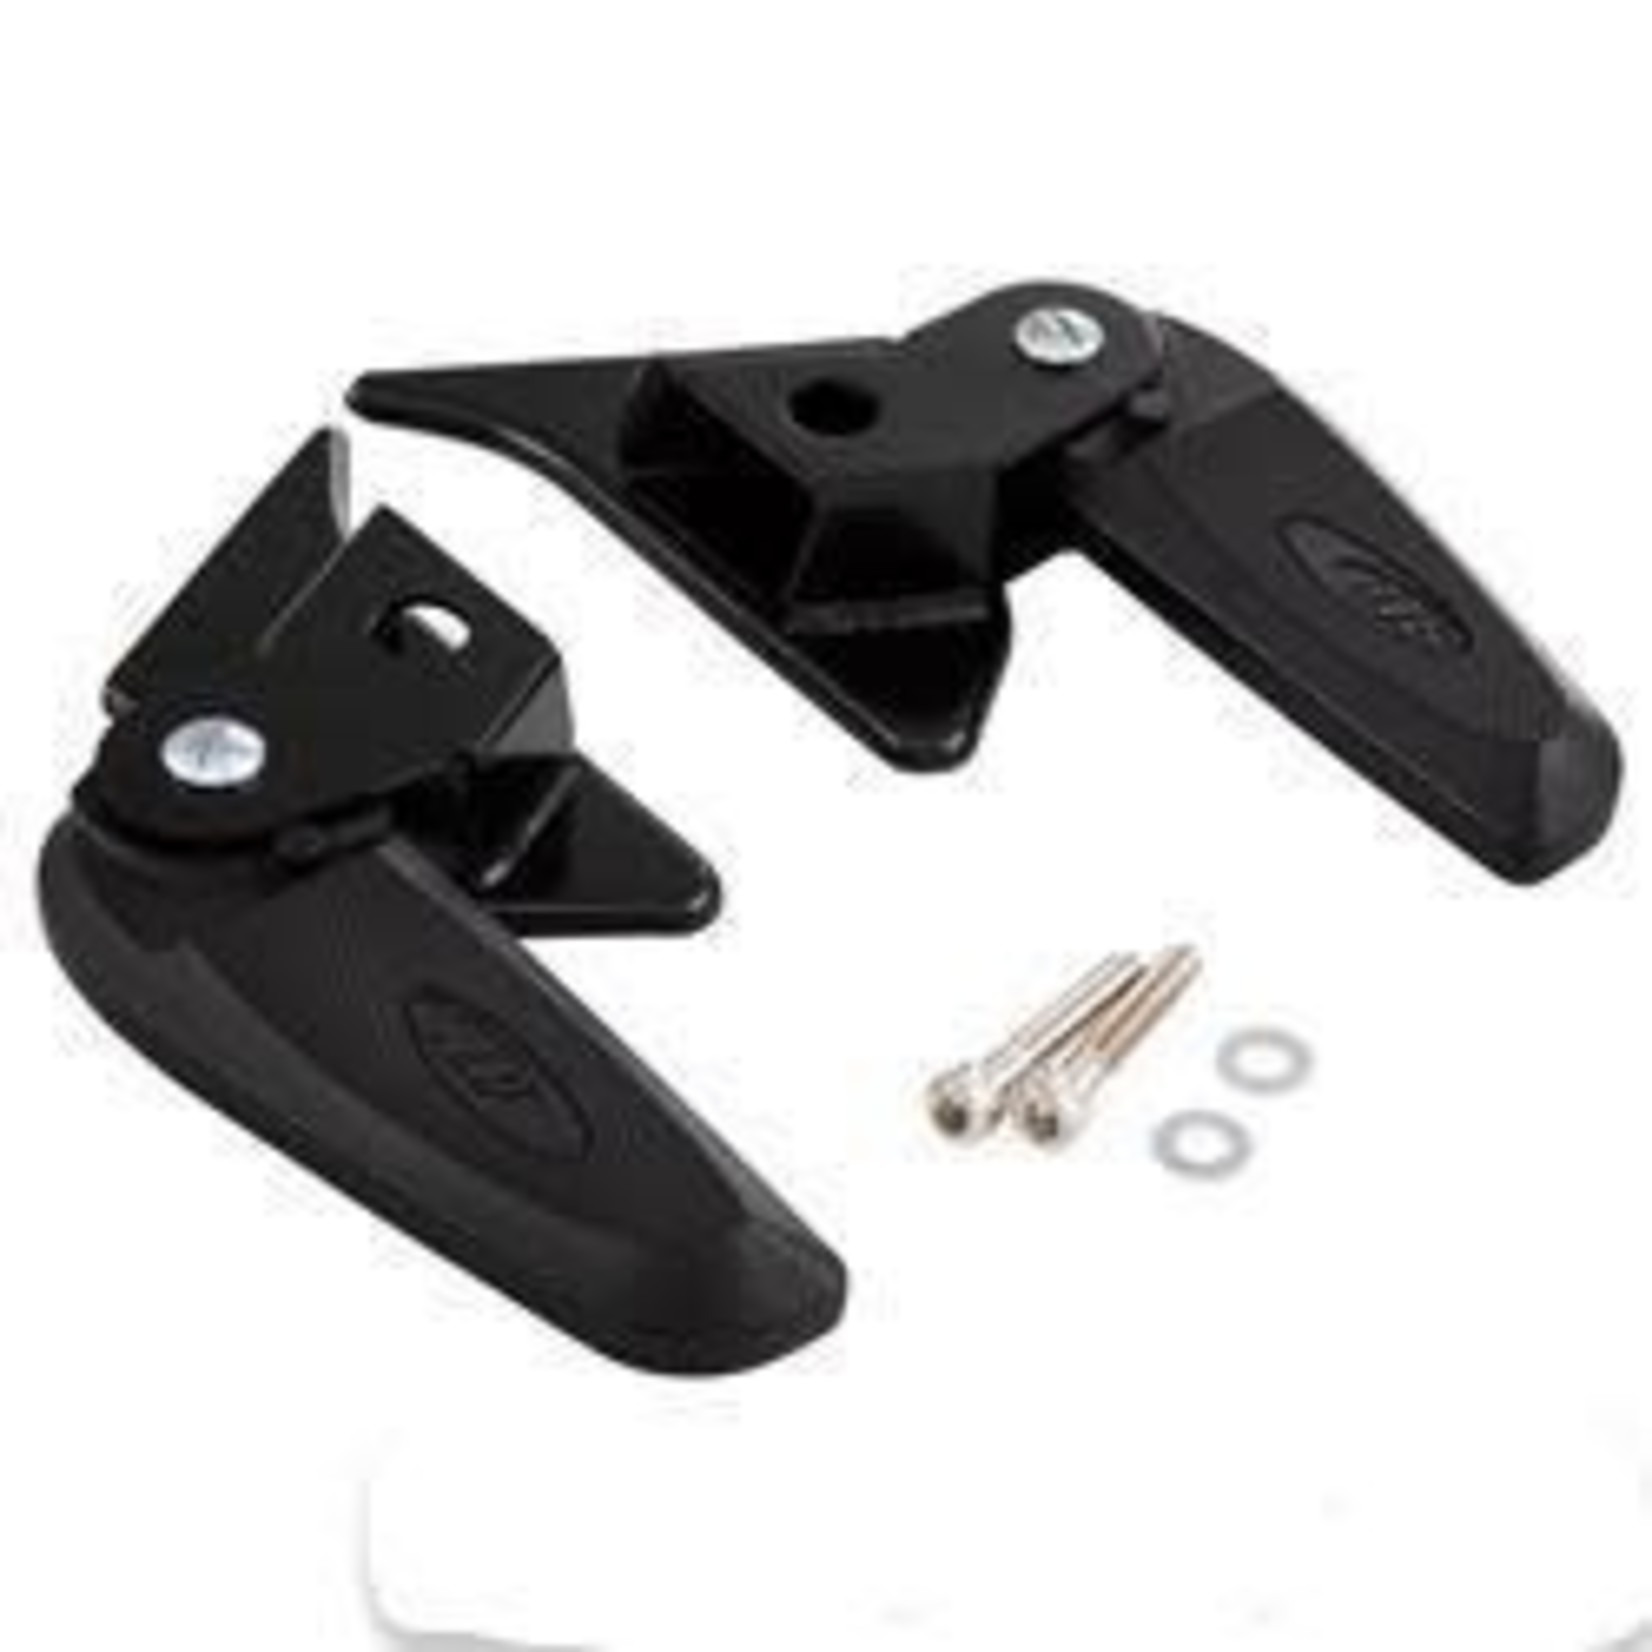 Accessories Foot Pegs, Vespa Primavera/Sprint Black 2015+